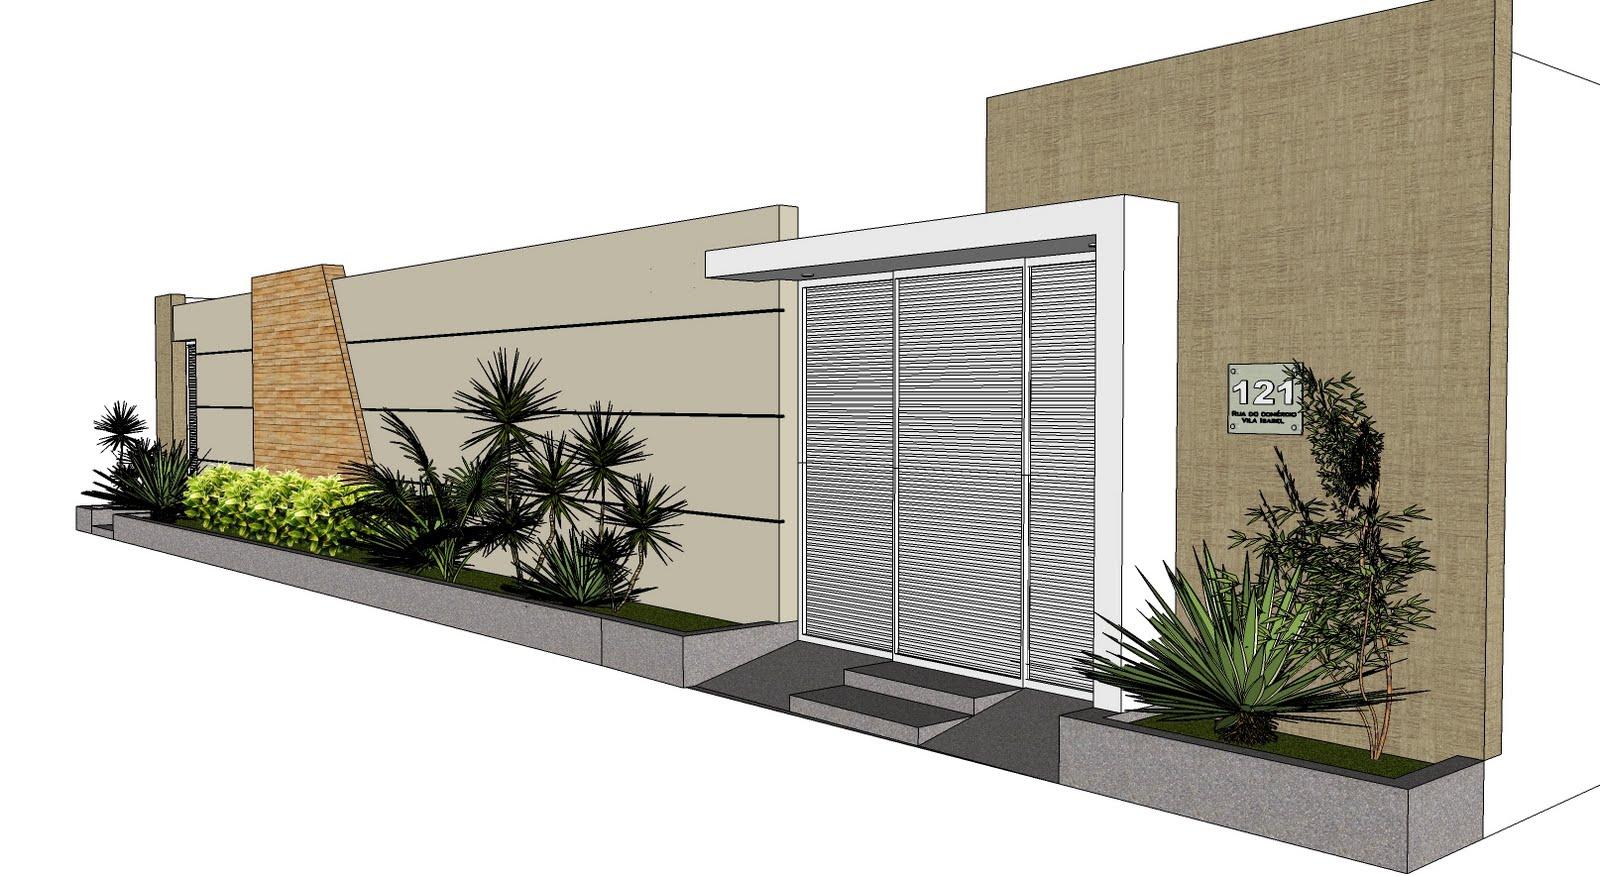 Projeto de fachada de muro moderna